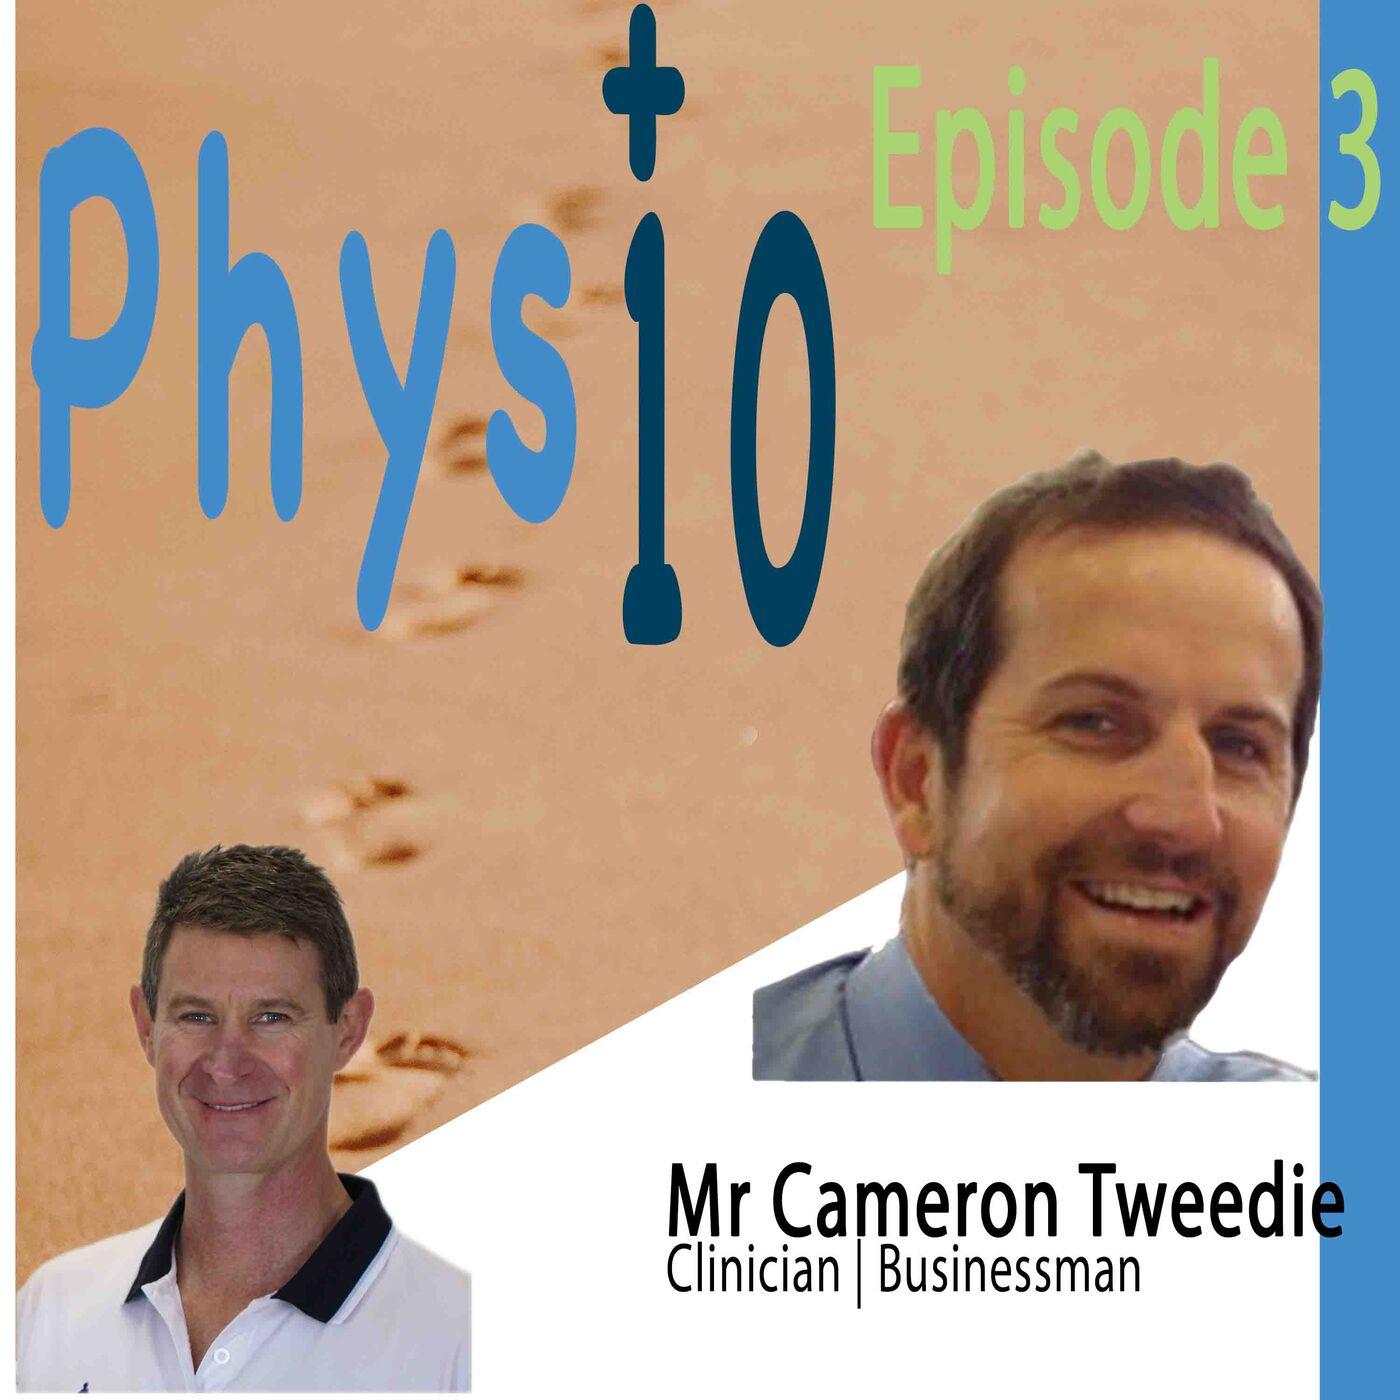 Cameron Tweedie: Clinician | Businessman